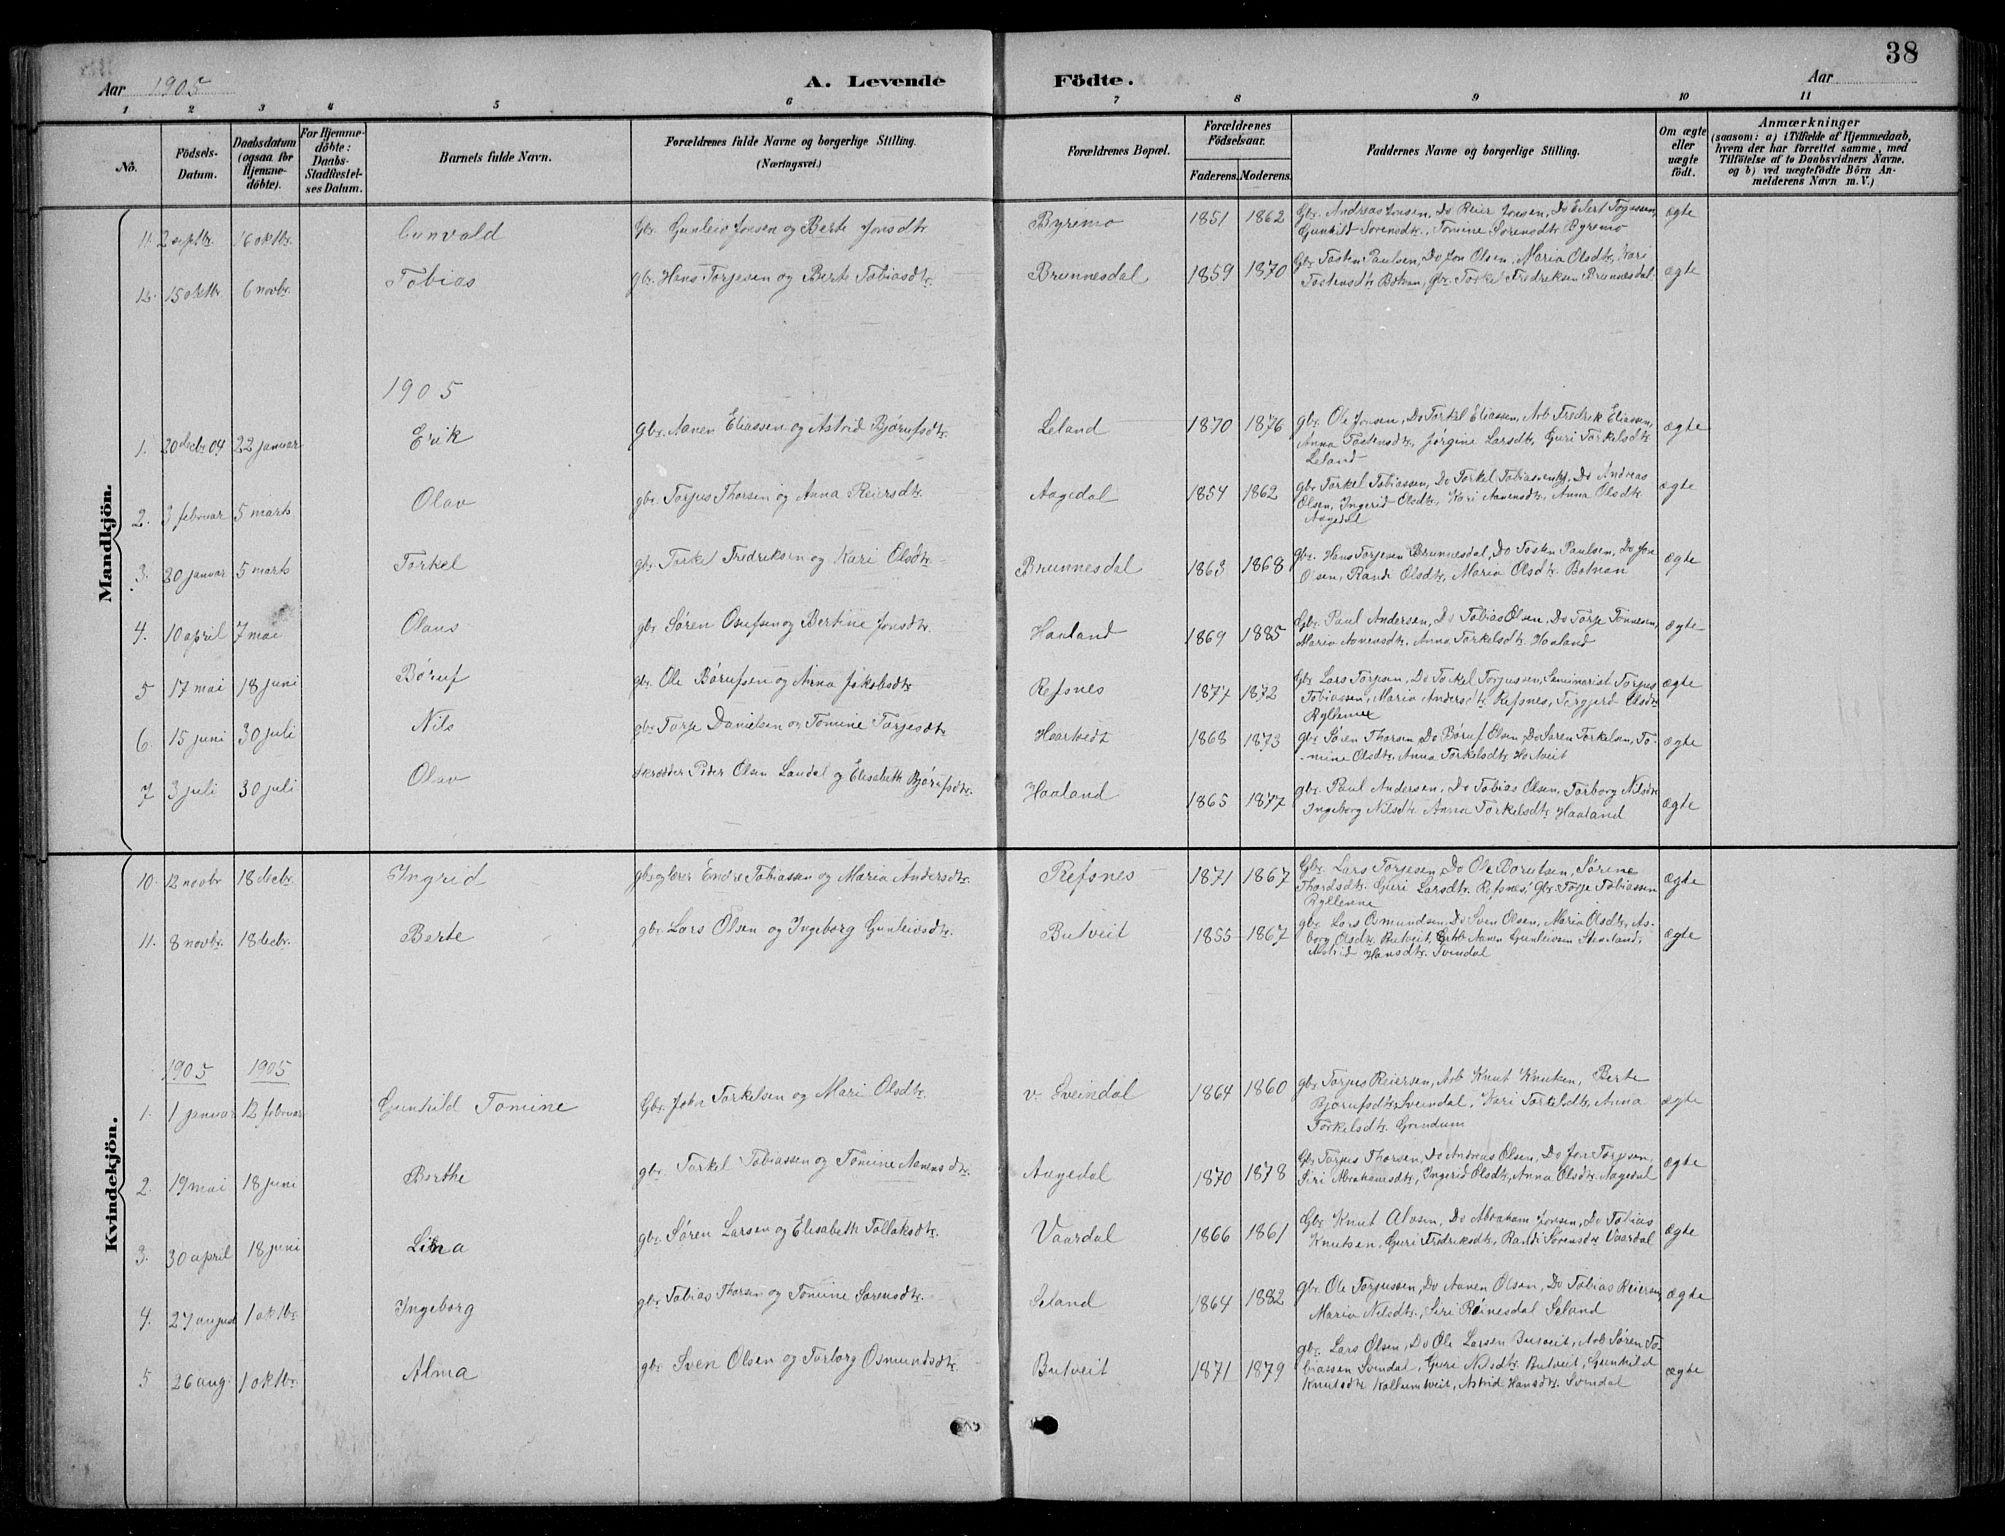 SAK, Bjelland sokneprestkontor, F/Fb/Fbc/L0003: Klokkerbok nr. B 3, 1887-1924, s. 38